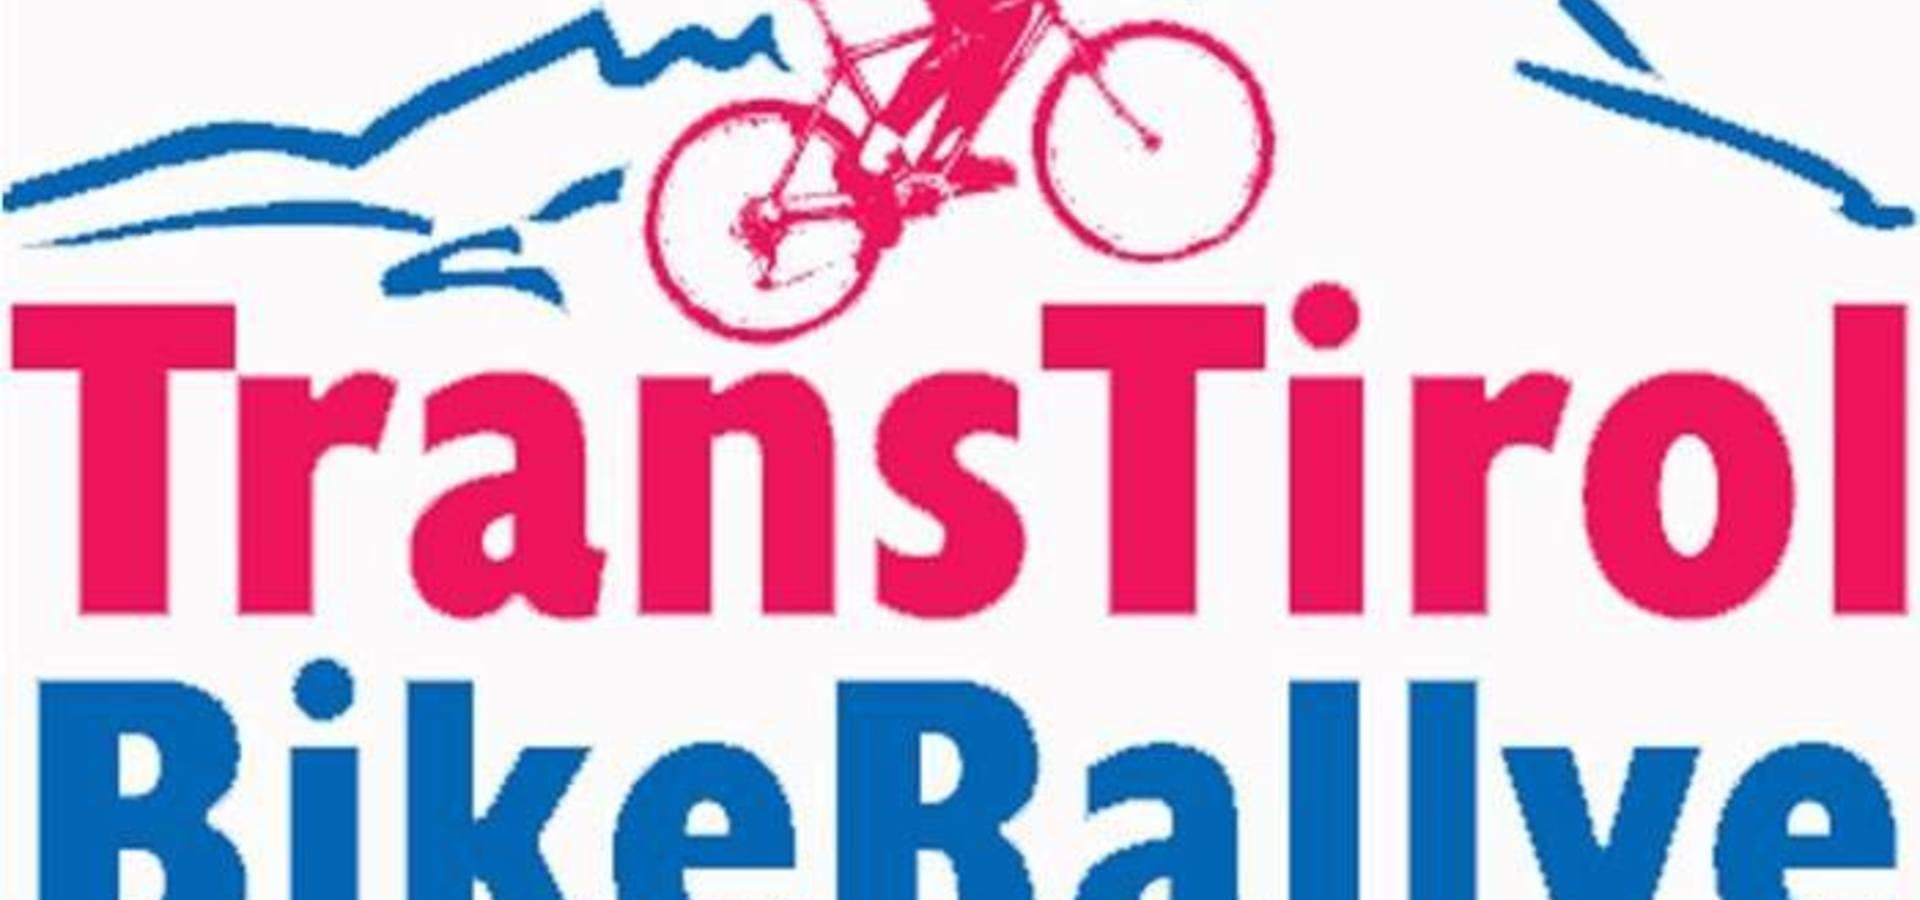 The TransTirol Bike Rallye 2019 crosses the beautiful Dolomites in Mtb